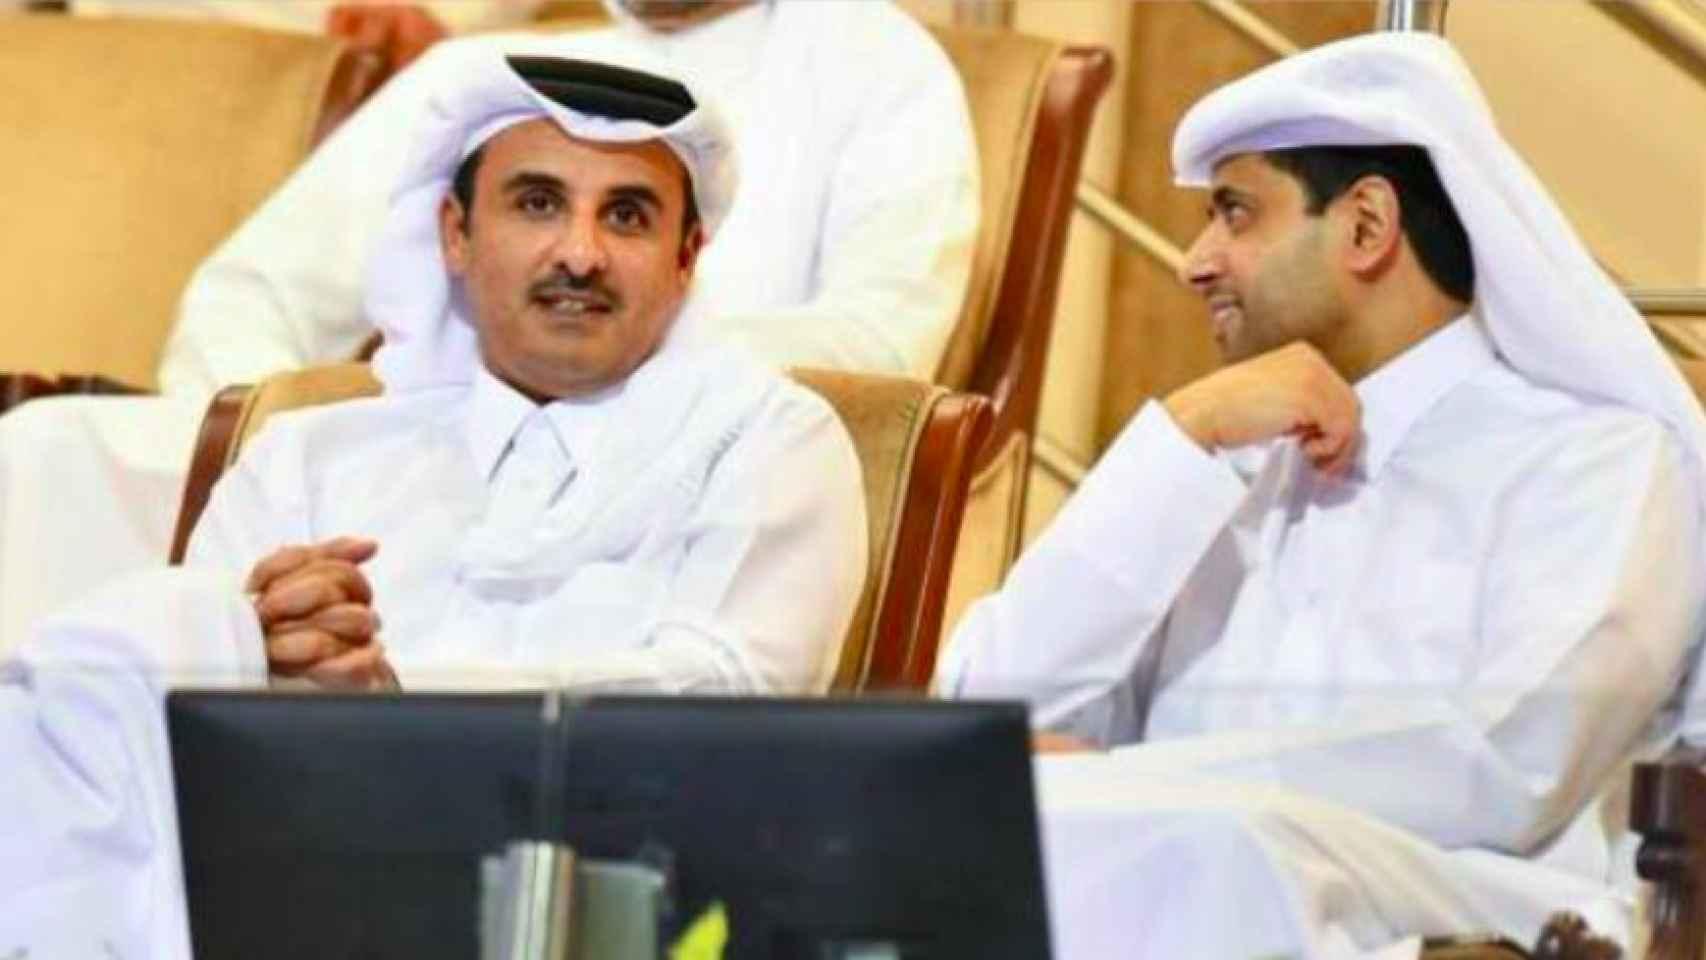 El emir de Catar y Nasser Al-Khelaifi